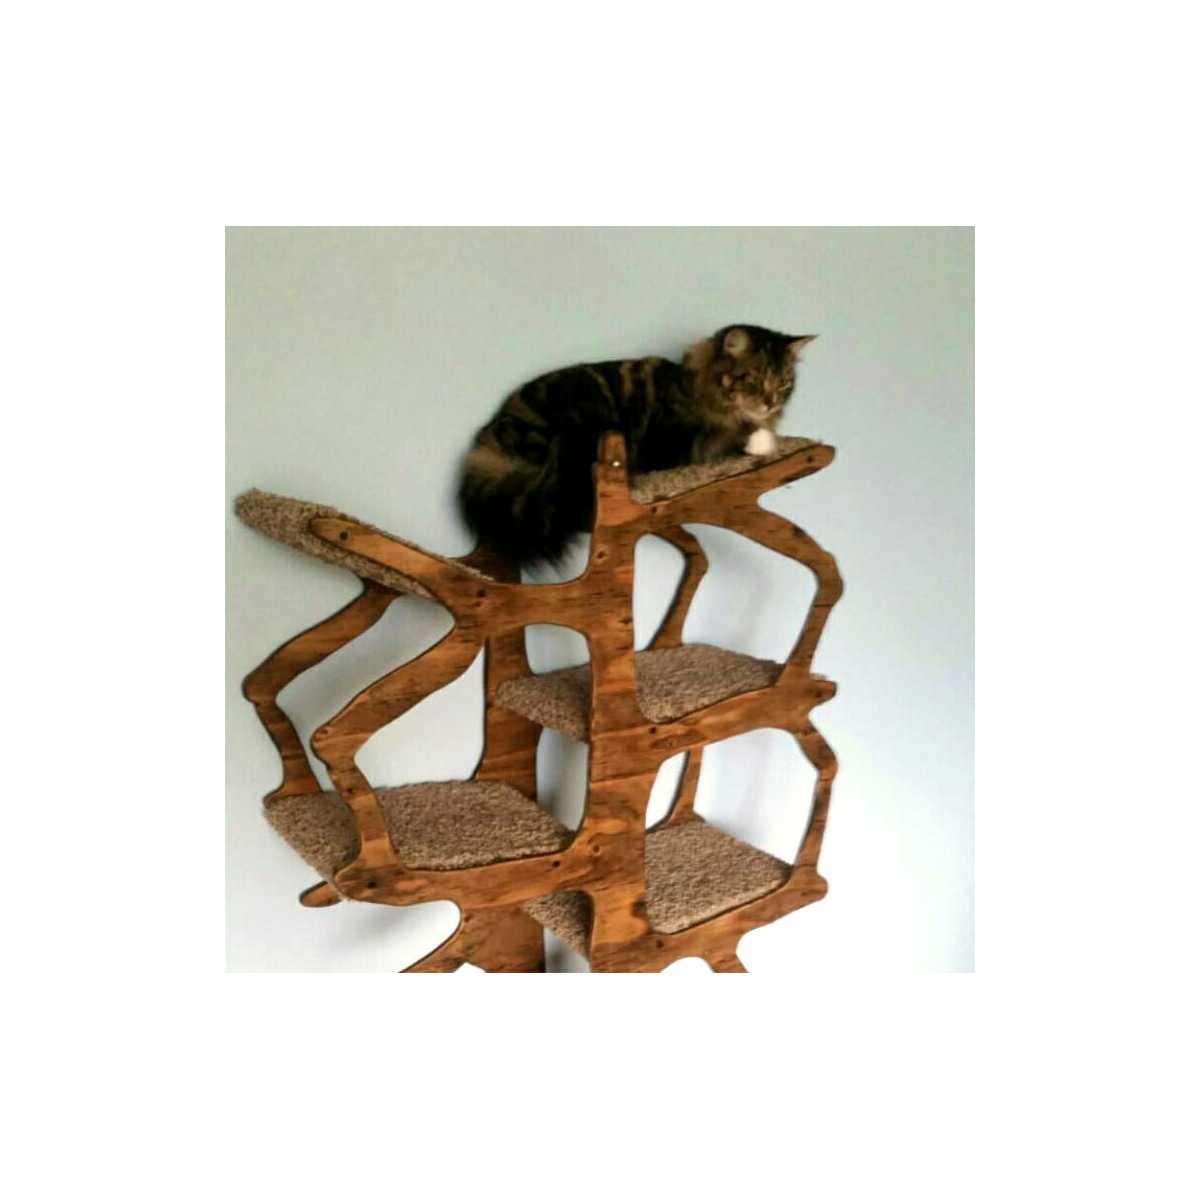 Fantastic Whimsical Artisan Handmade Cat Tree CA09